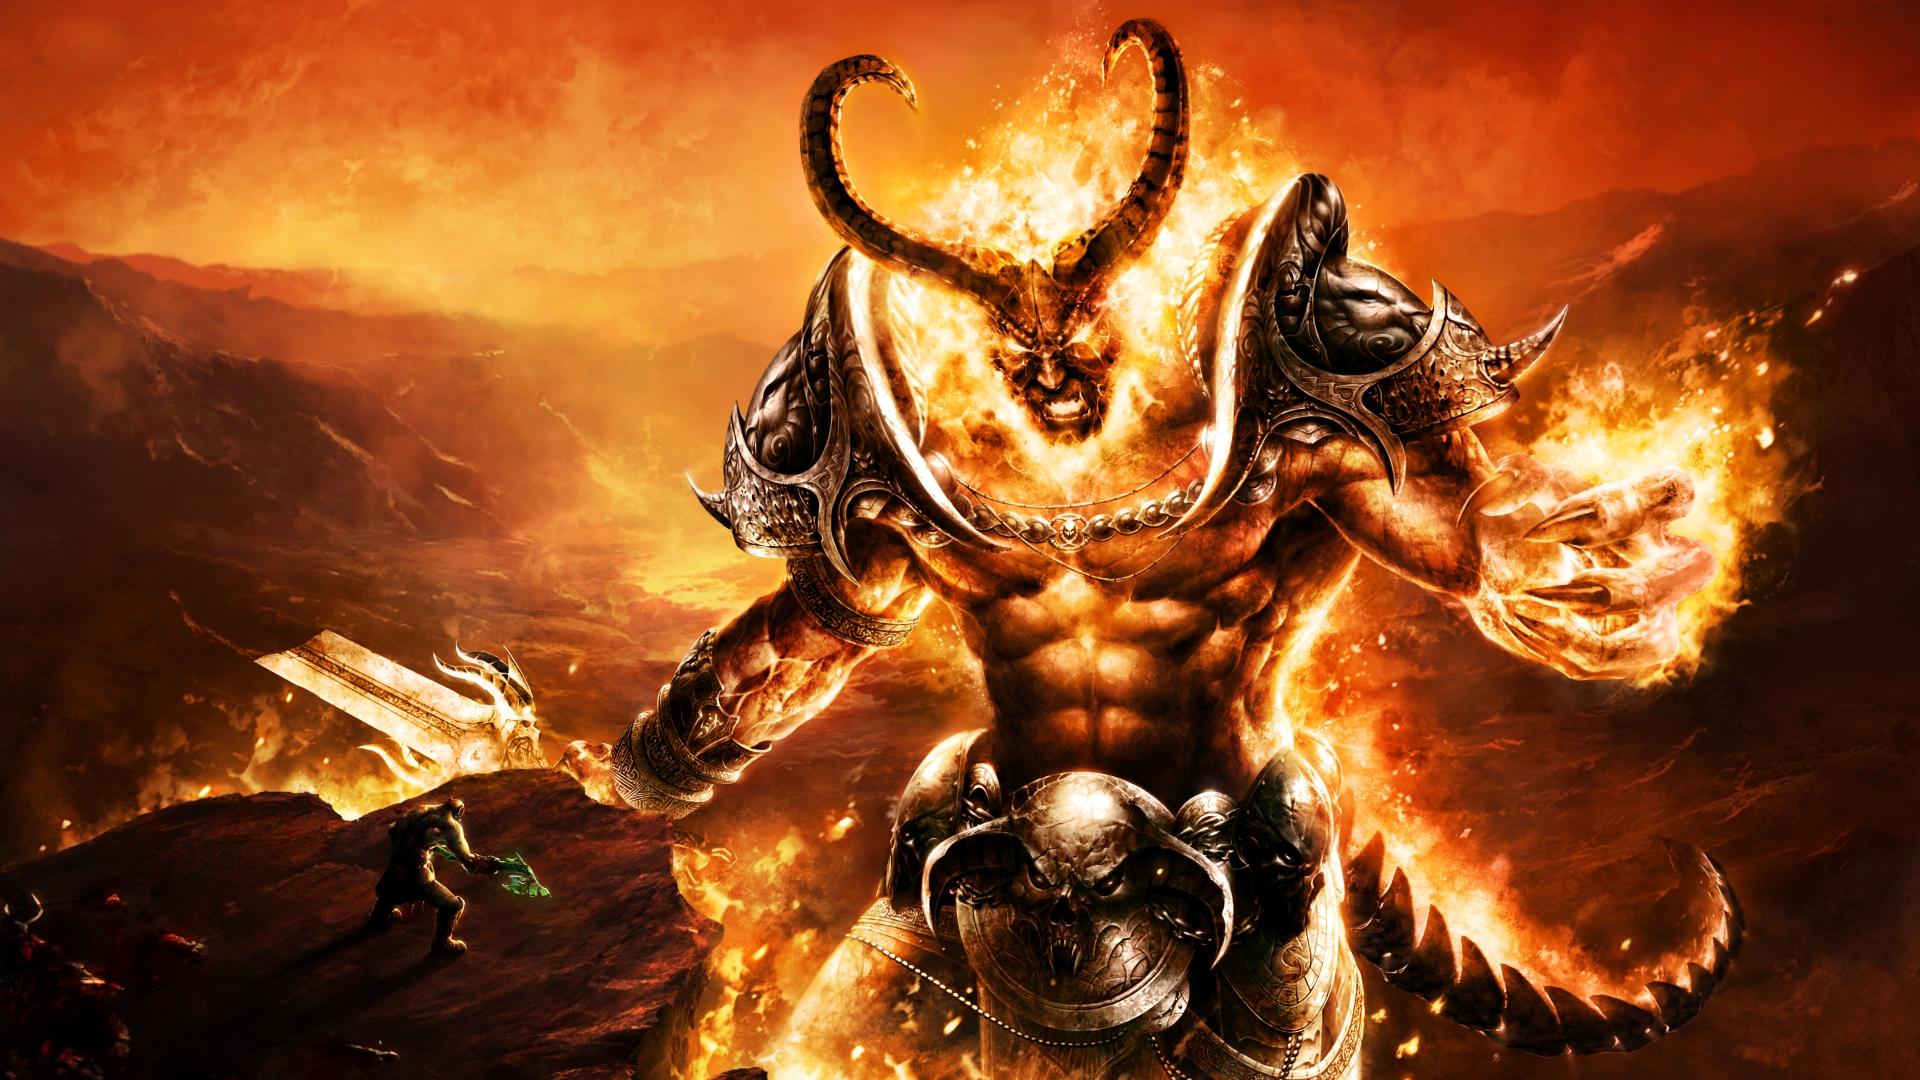 Download Fantasy Demon Wallpaper Full HD Wallpapers 1920x1080